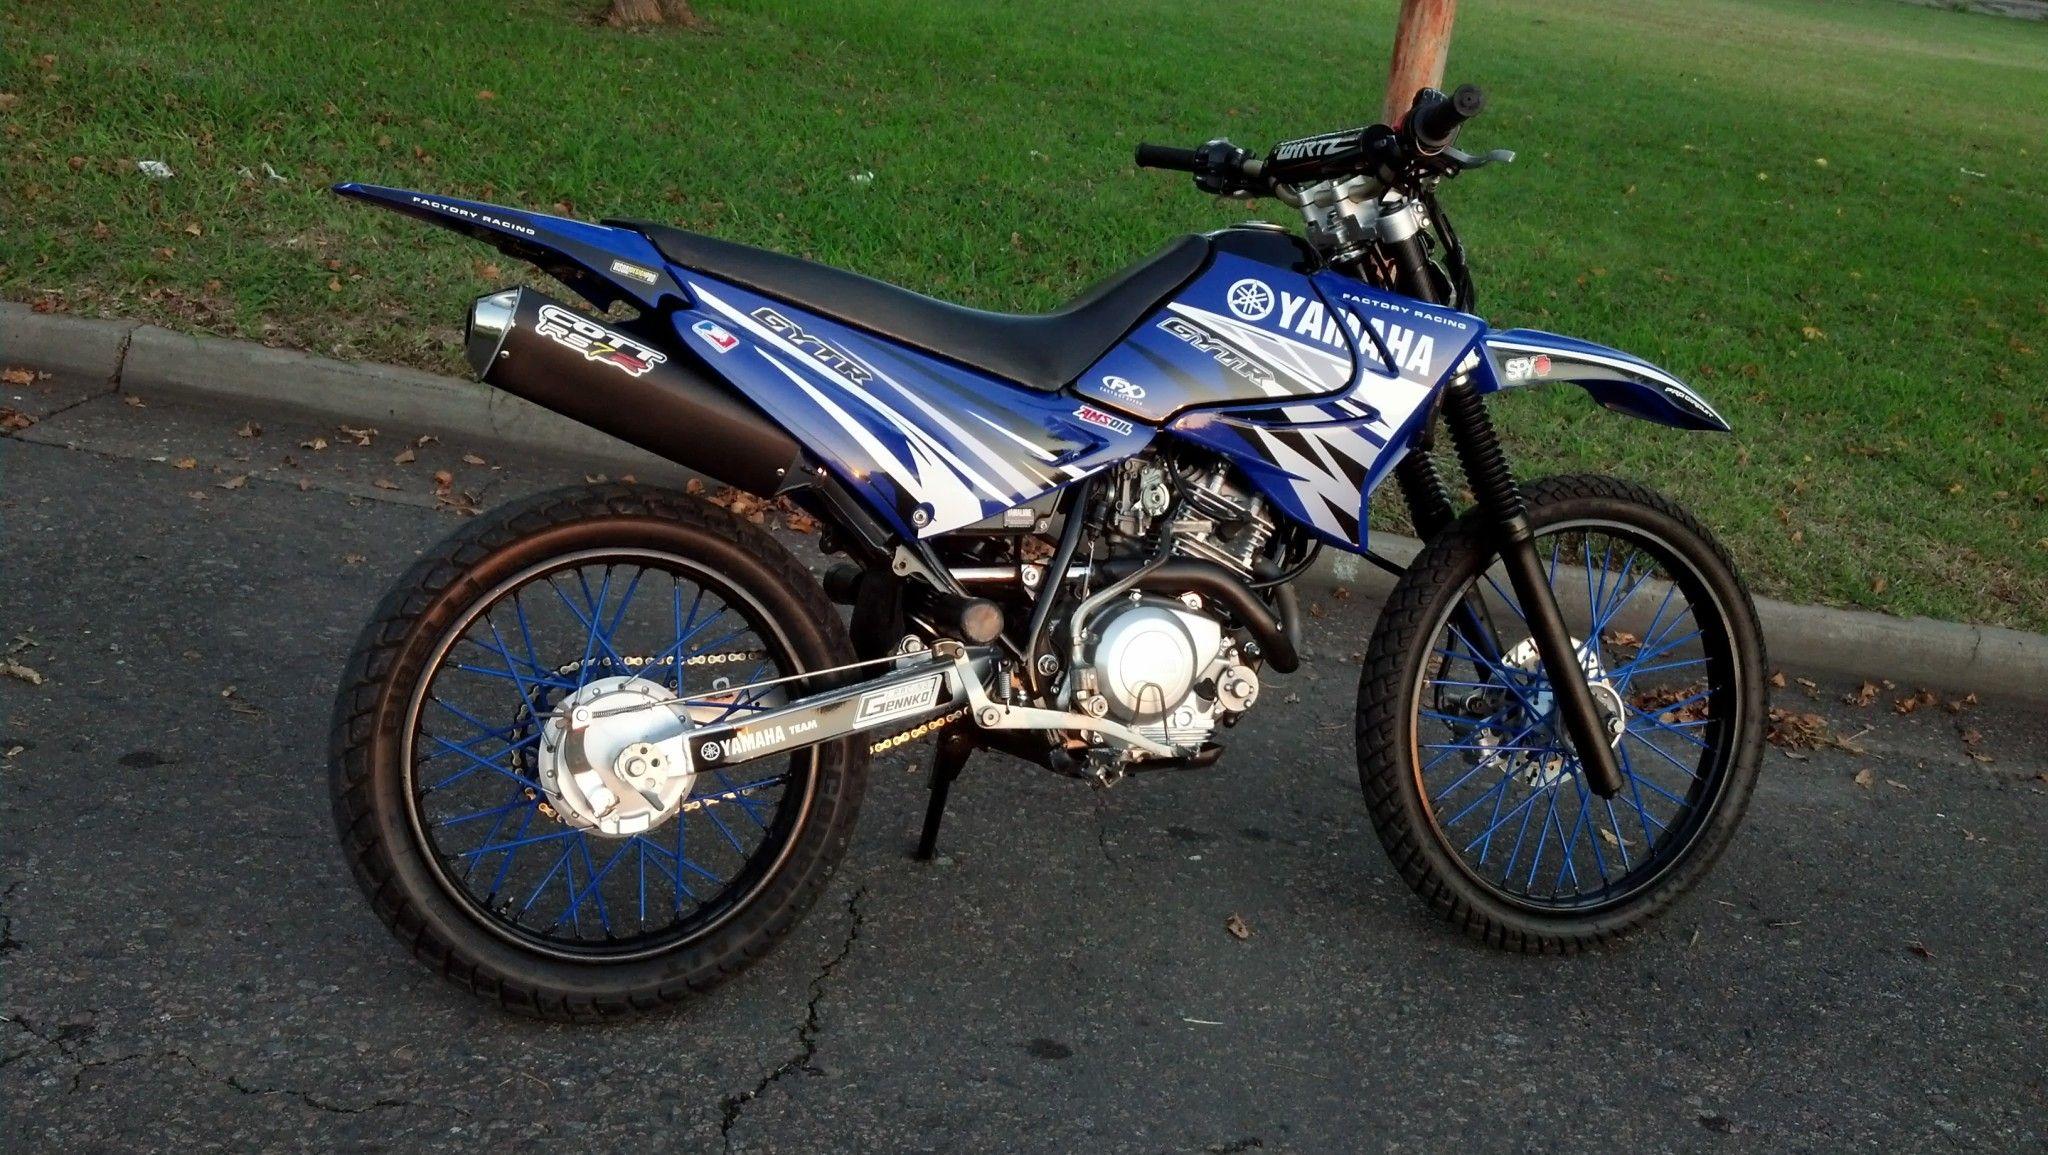 Consulta xr 150 o xtz 125 motoqueros 5800 comunidad oficial